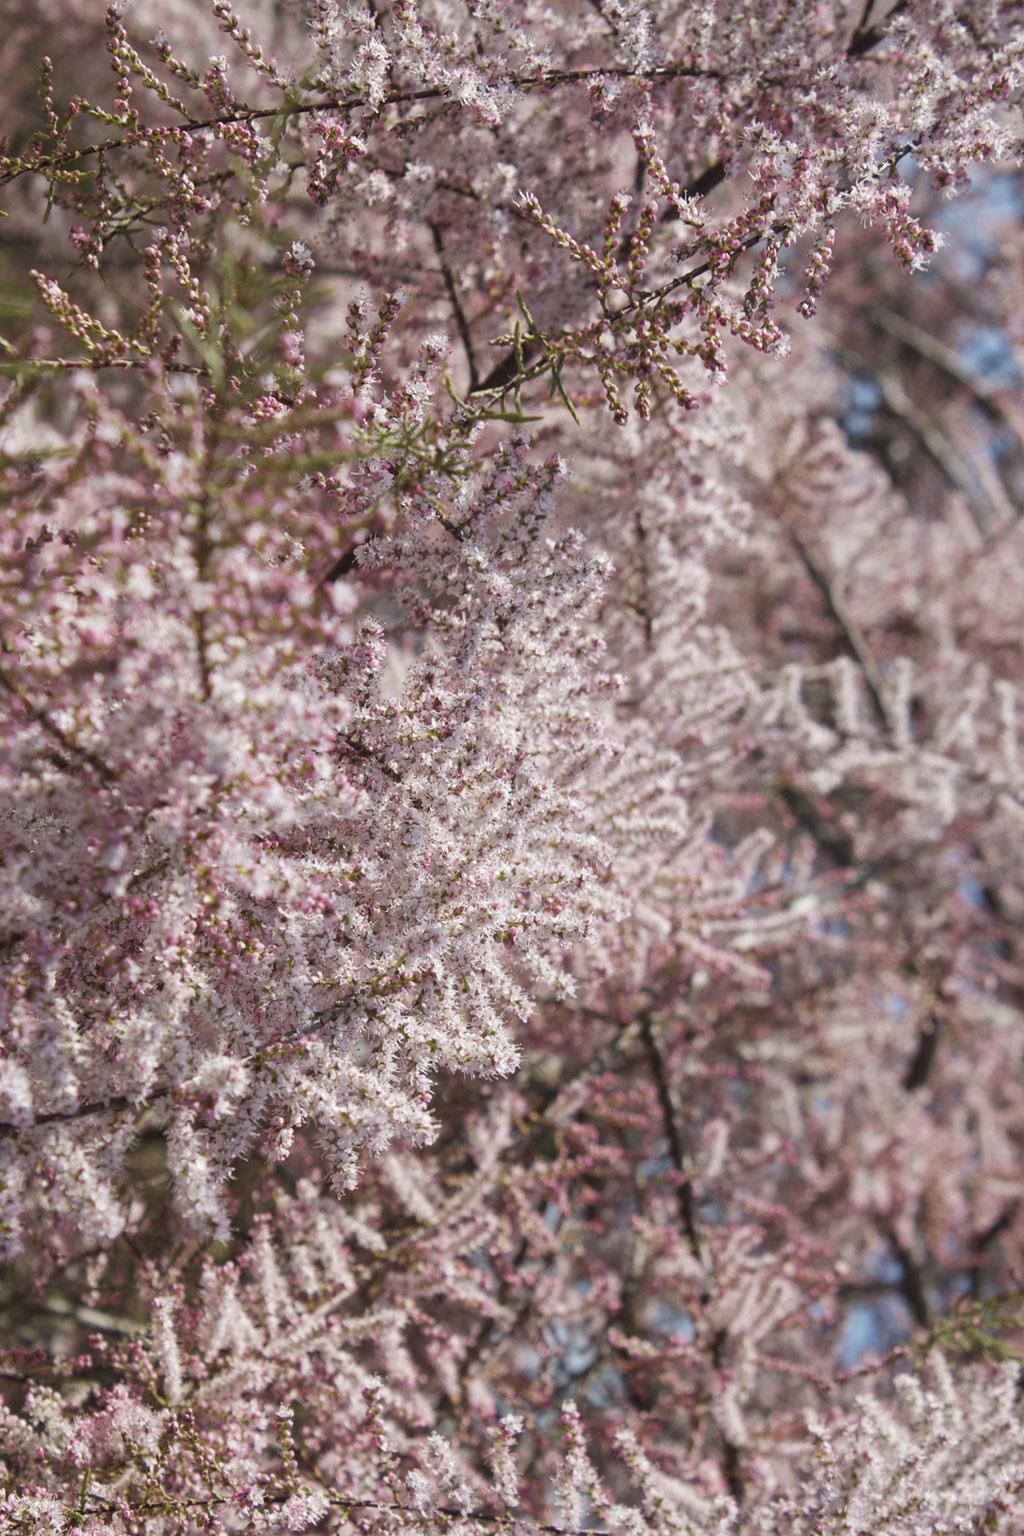 dieartigeBLOG - Special Guest: Tamariske, Teil des Baumes